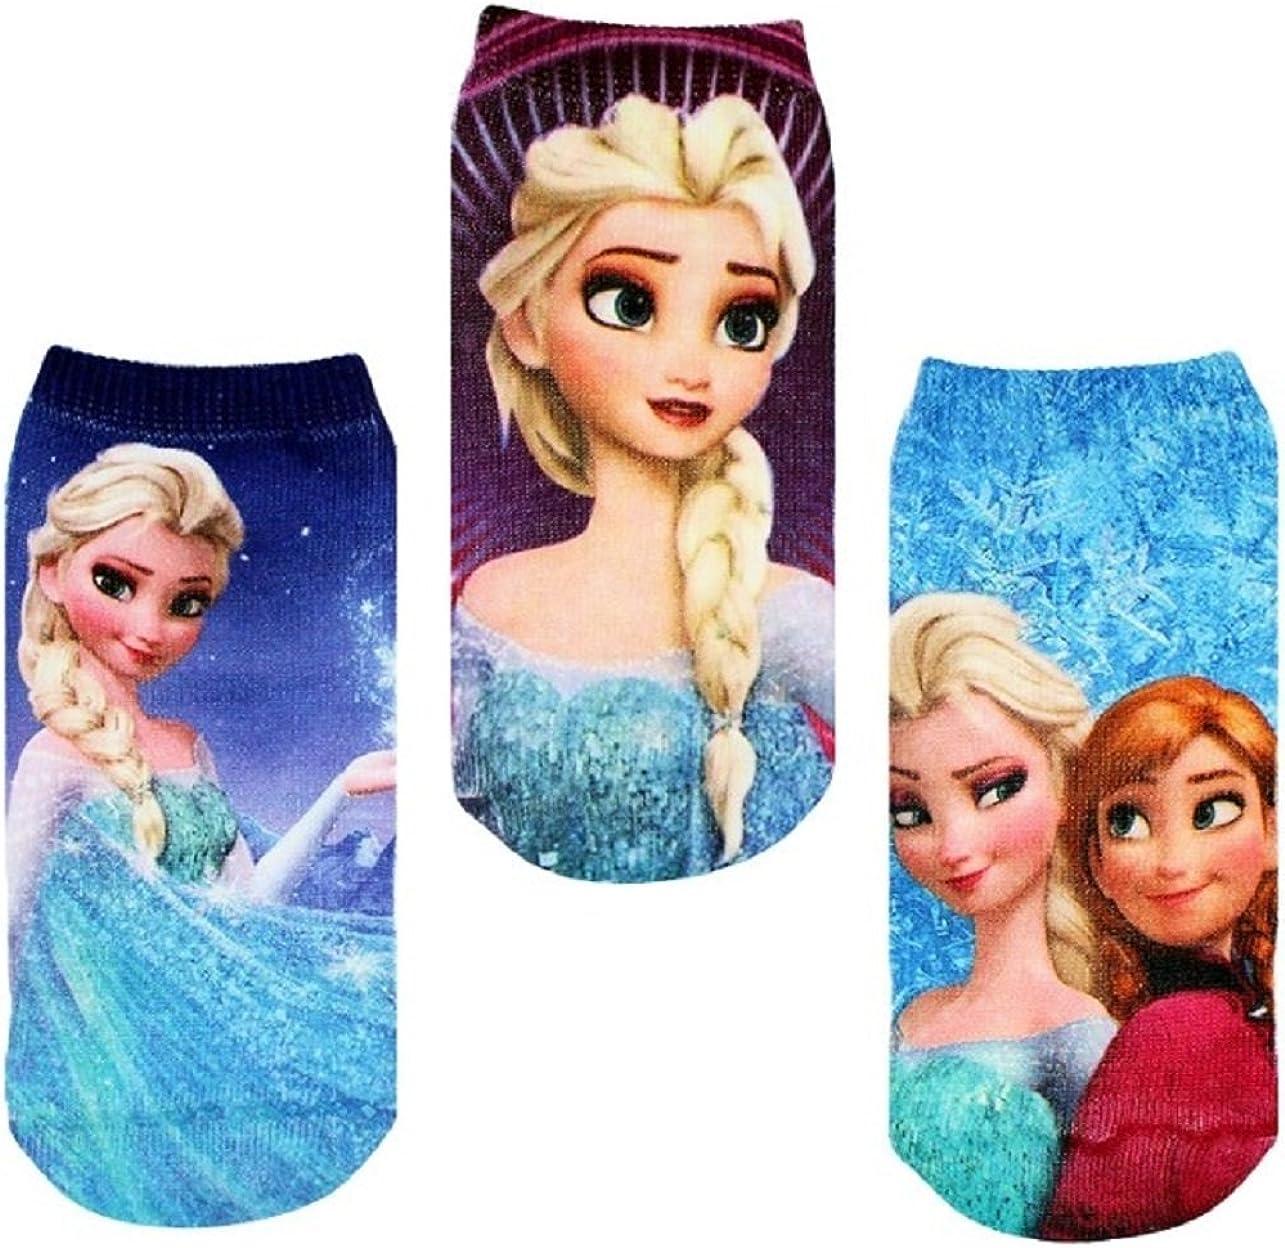 Frozen Elsa & Anna Socks 4 Pairs